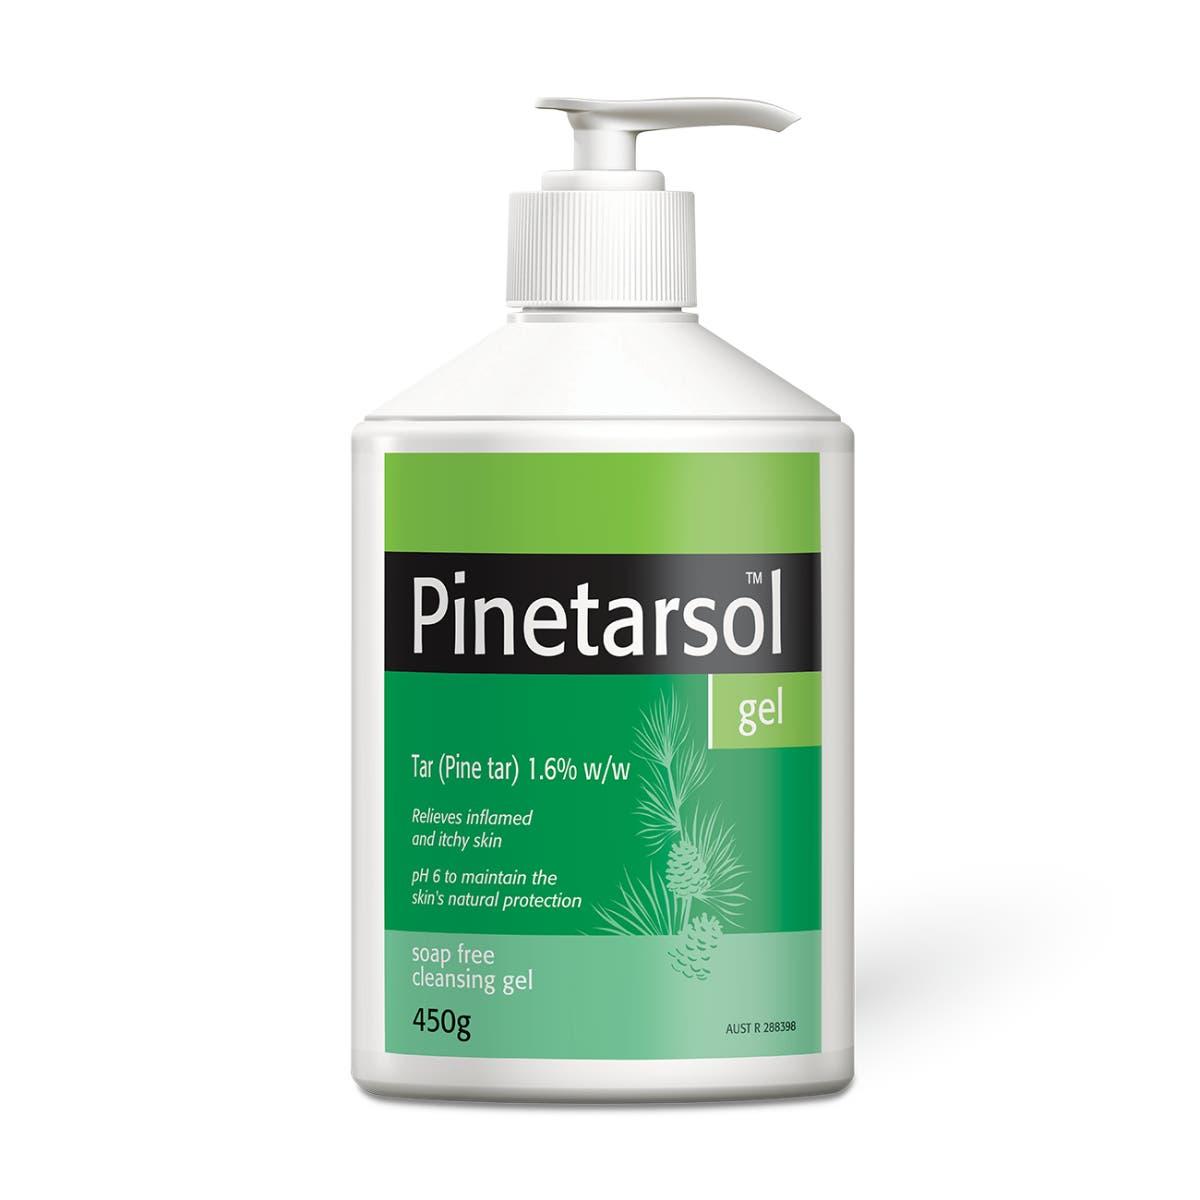 Pinetarsol Gel 450g